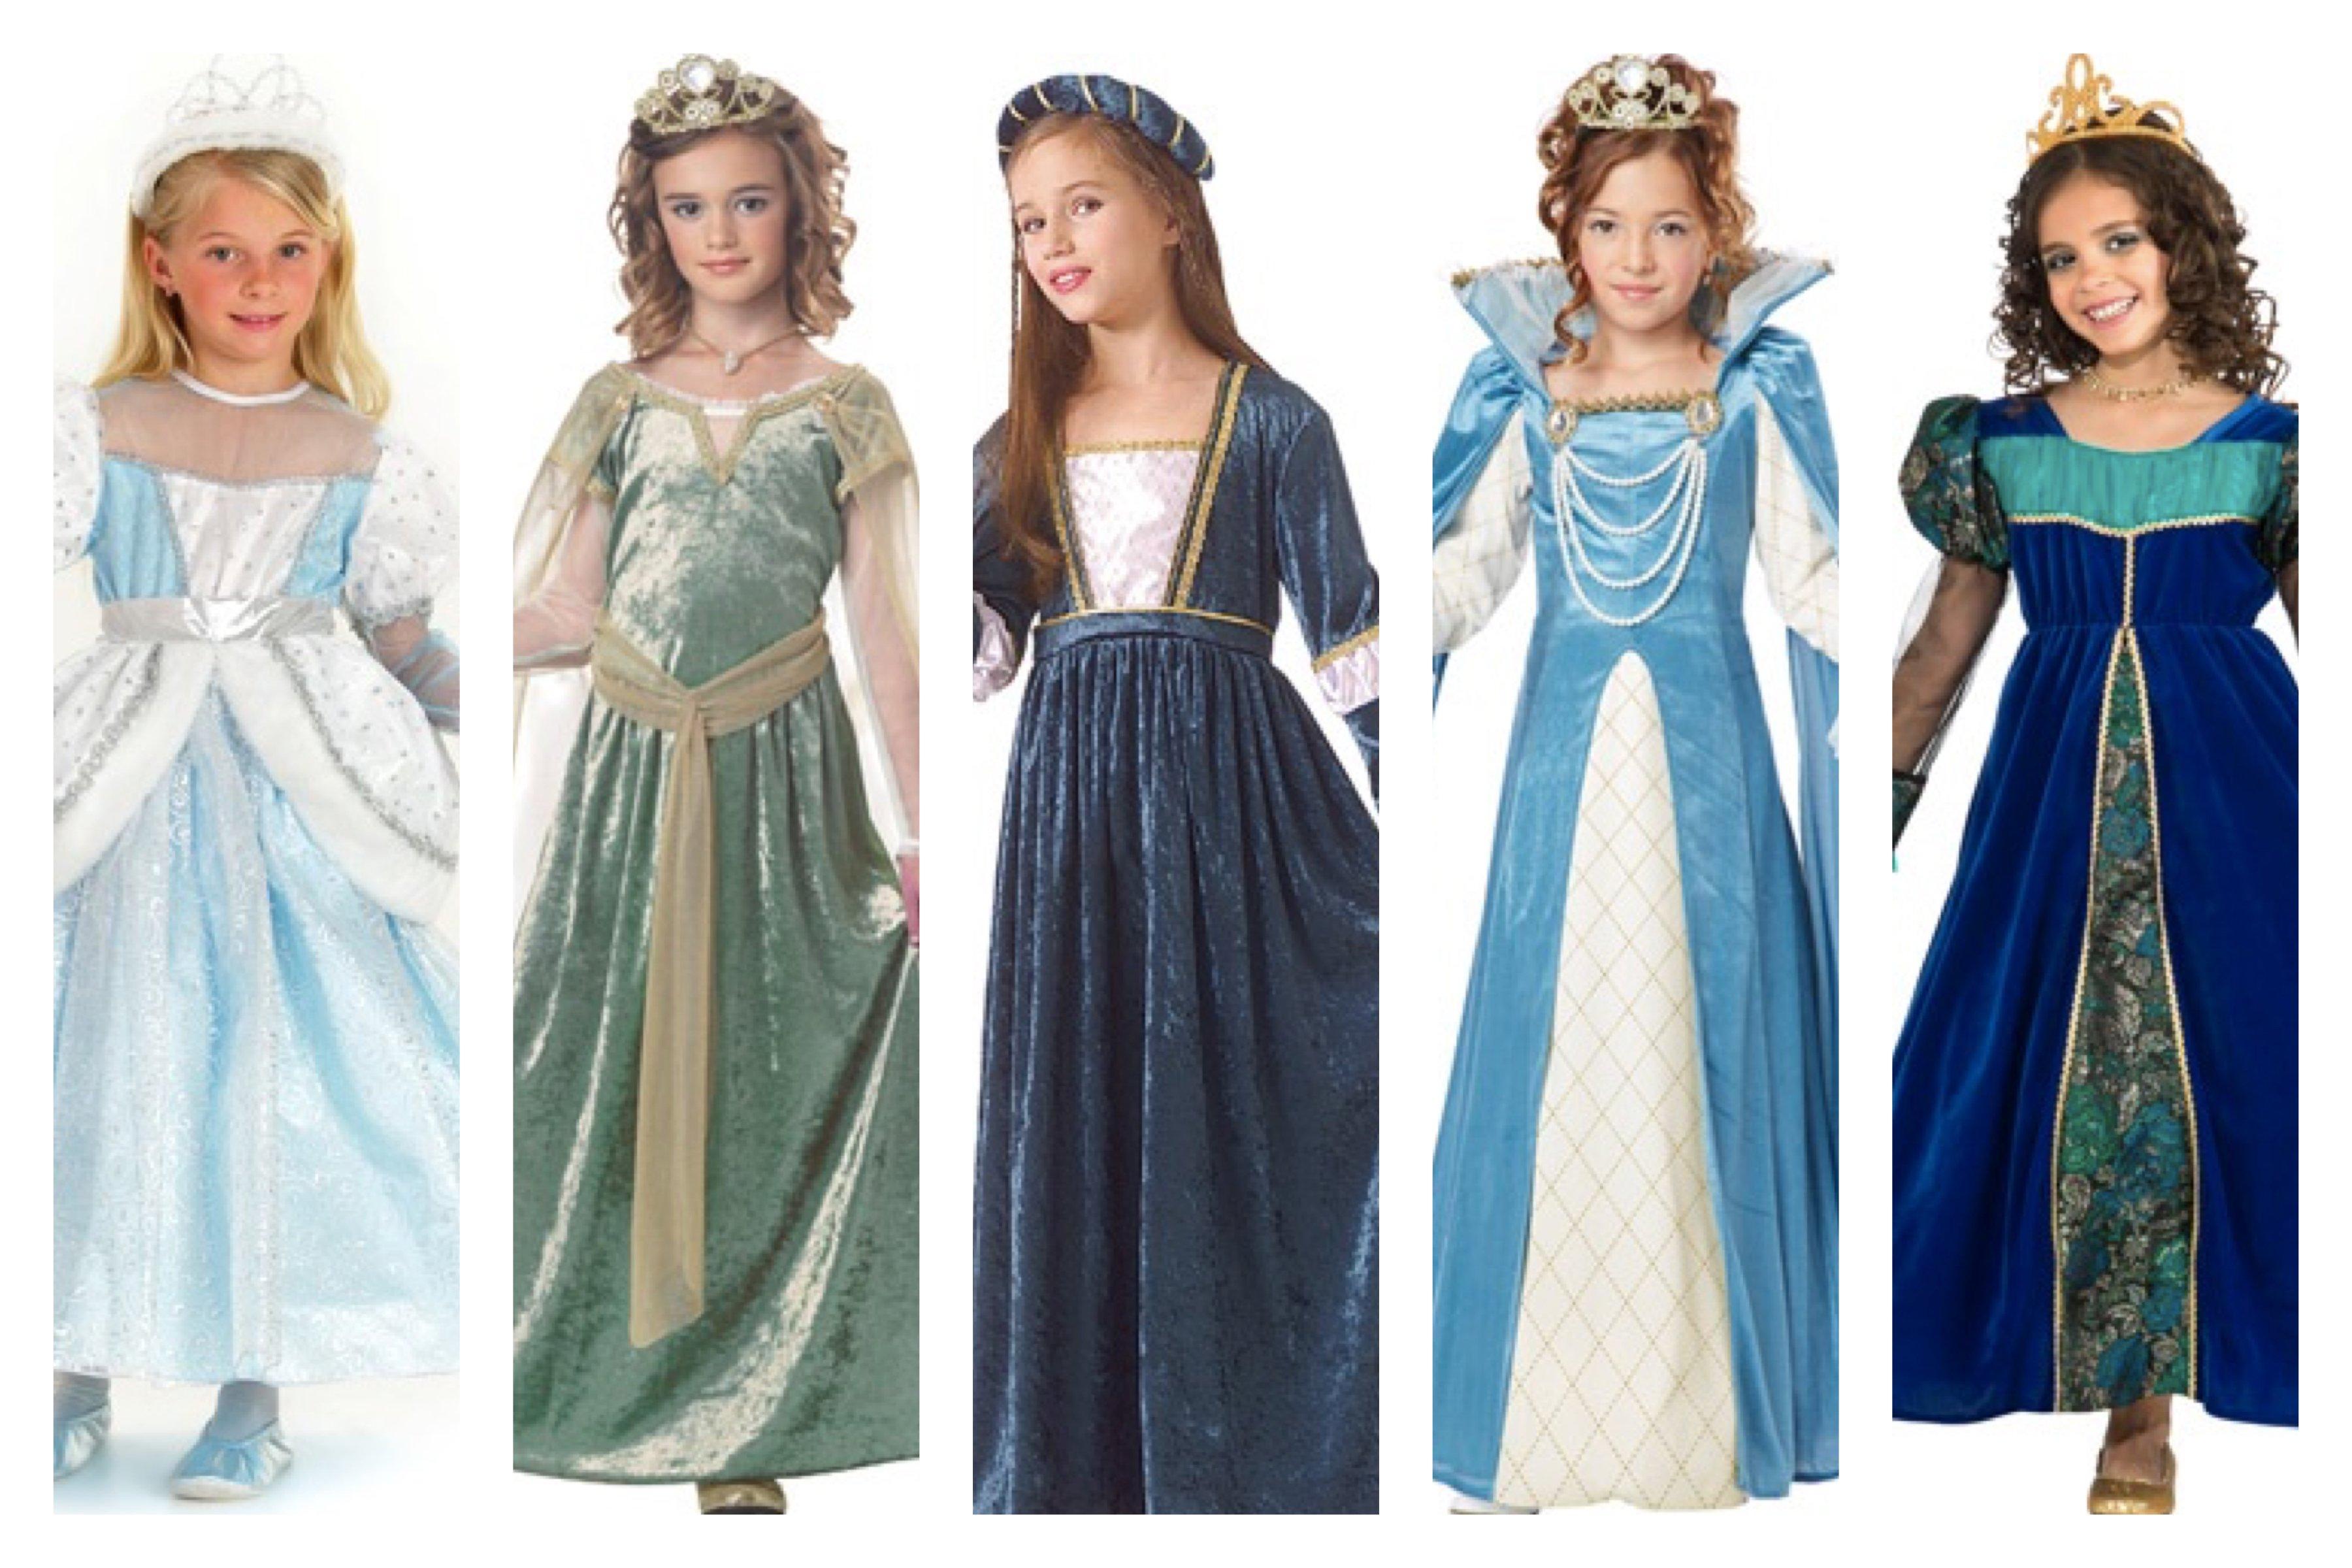 Queen Esther Girls Purim Costumes